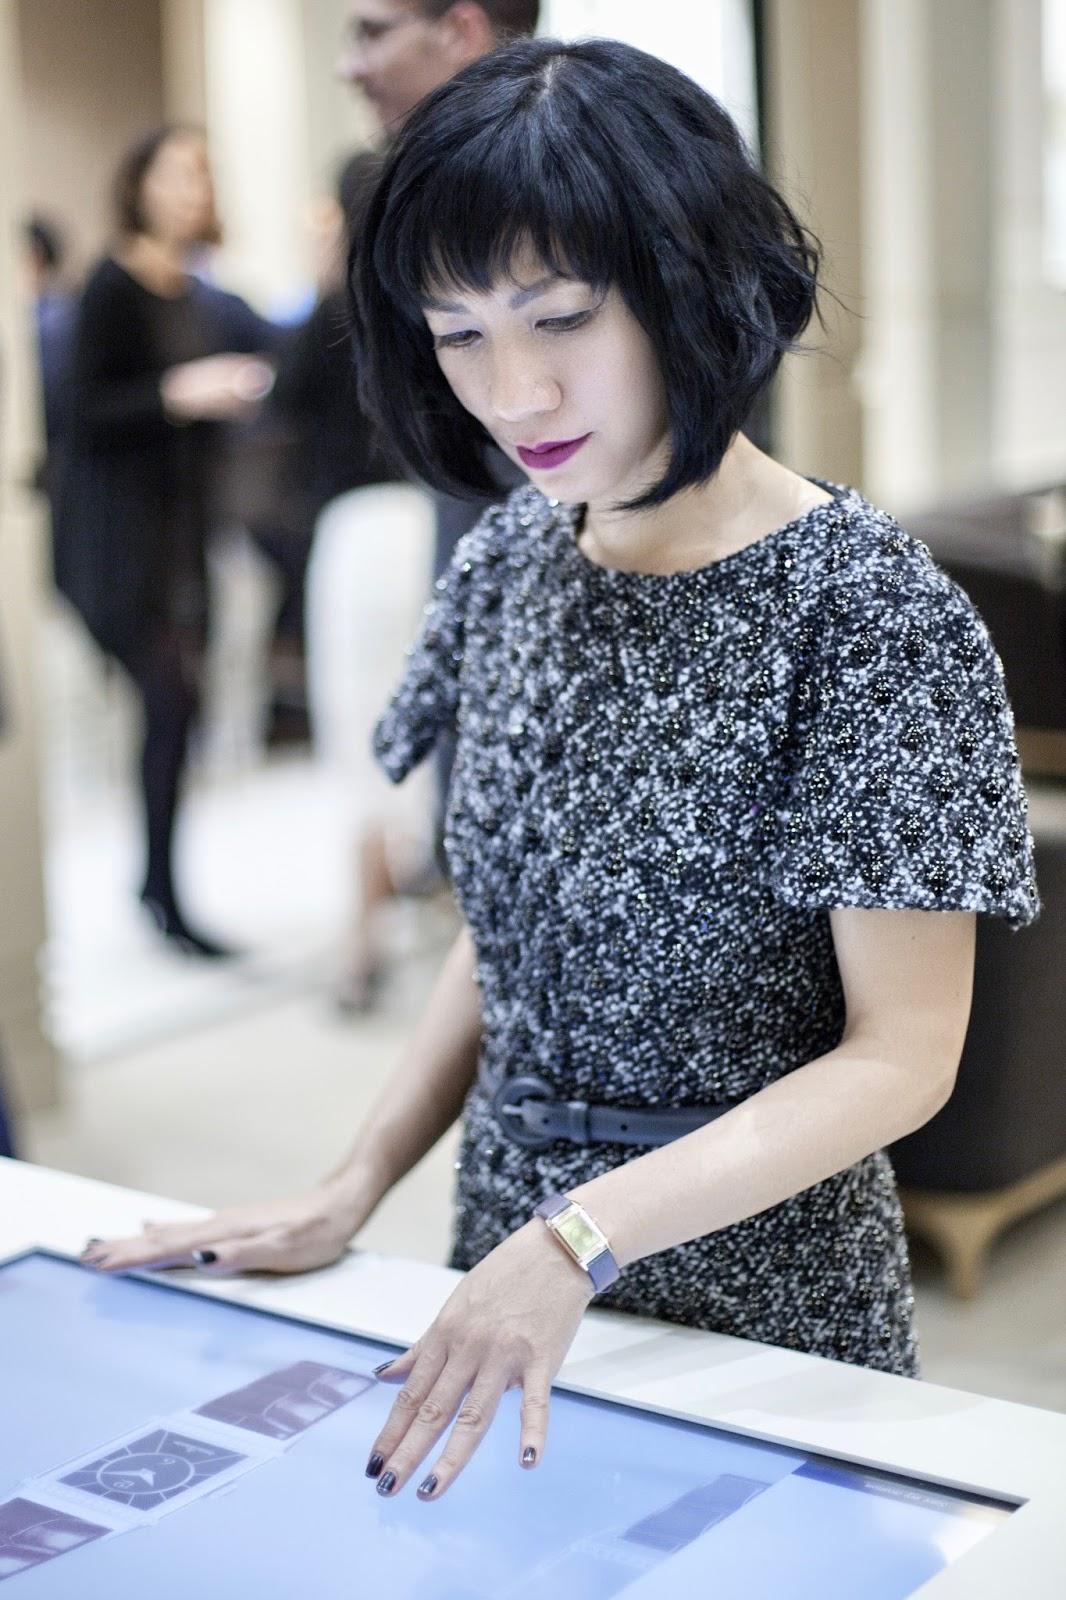 Janice wong fashion blogger 10 Things To Do @ Qing Xin Ling Leisure